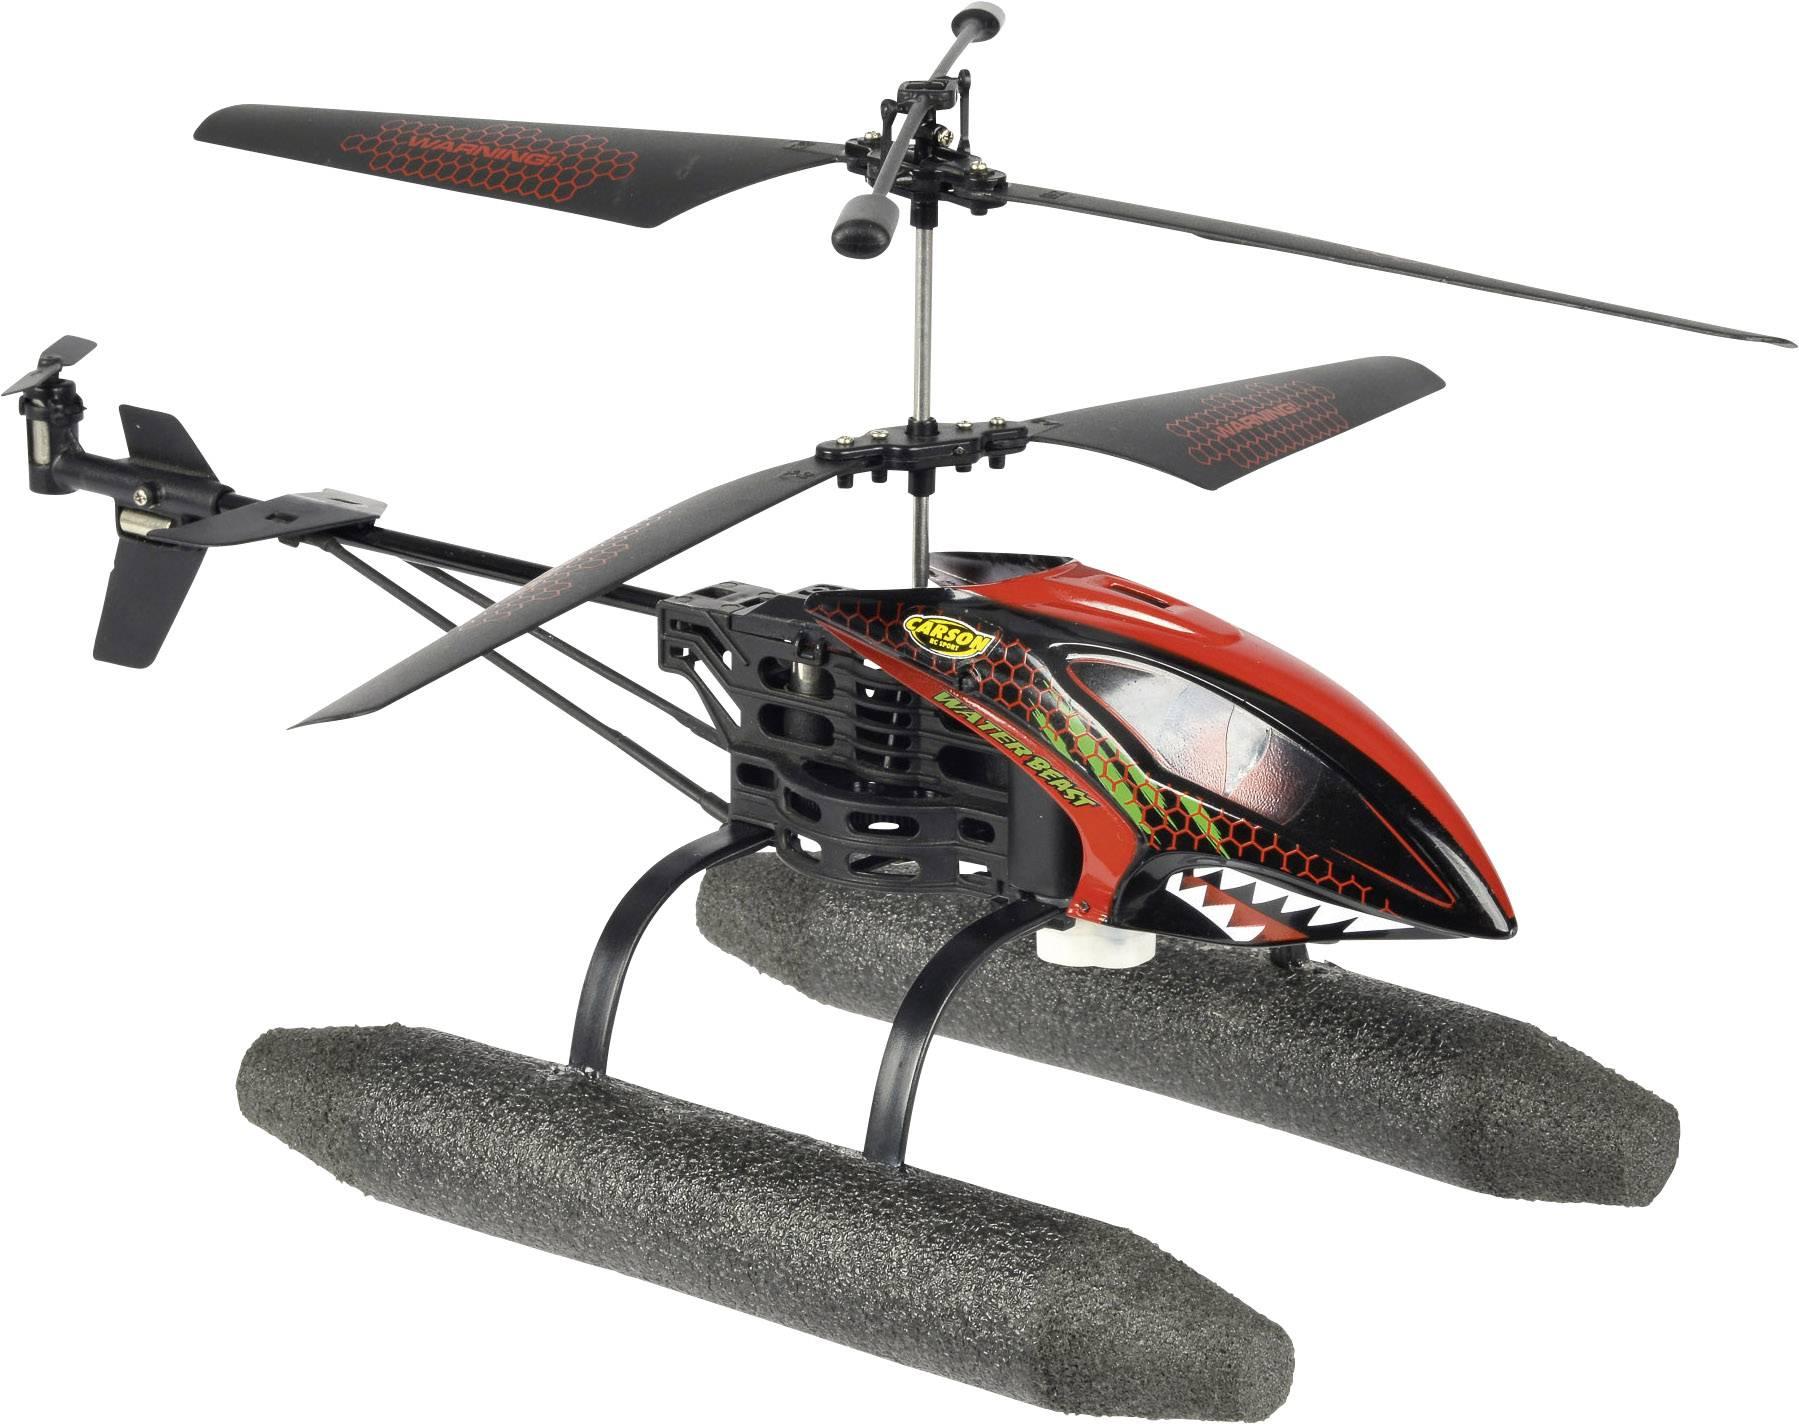 RC model vrtulníku pro začátečníky Carson RC Sport Easy Tyrann 235 Waterbeast, RtF